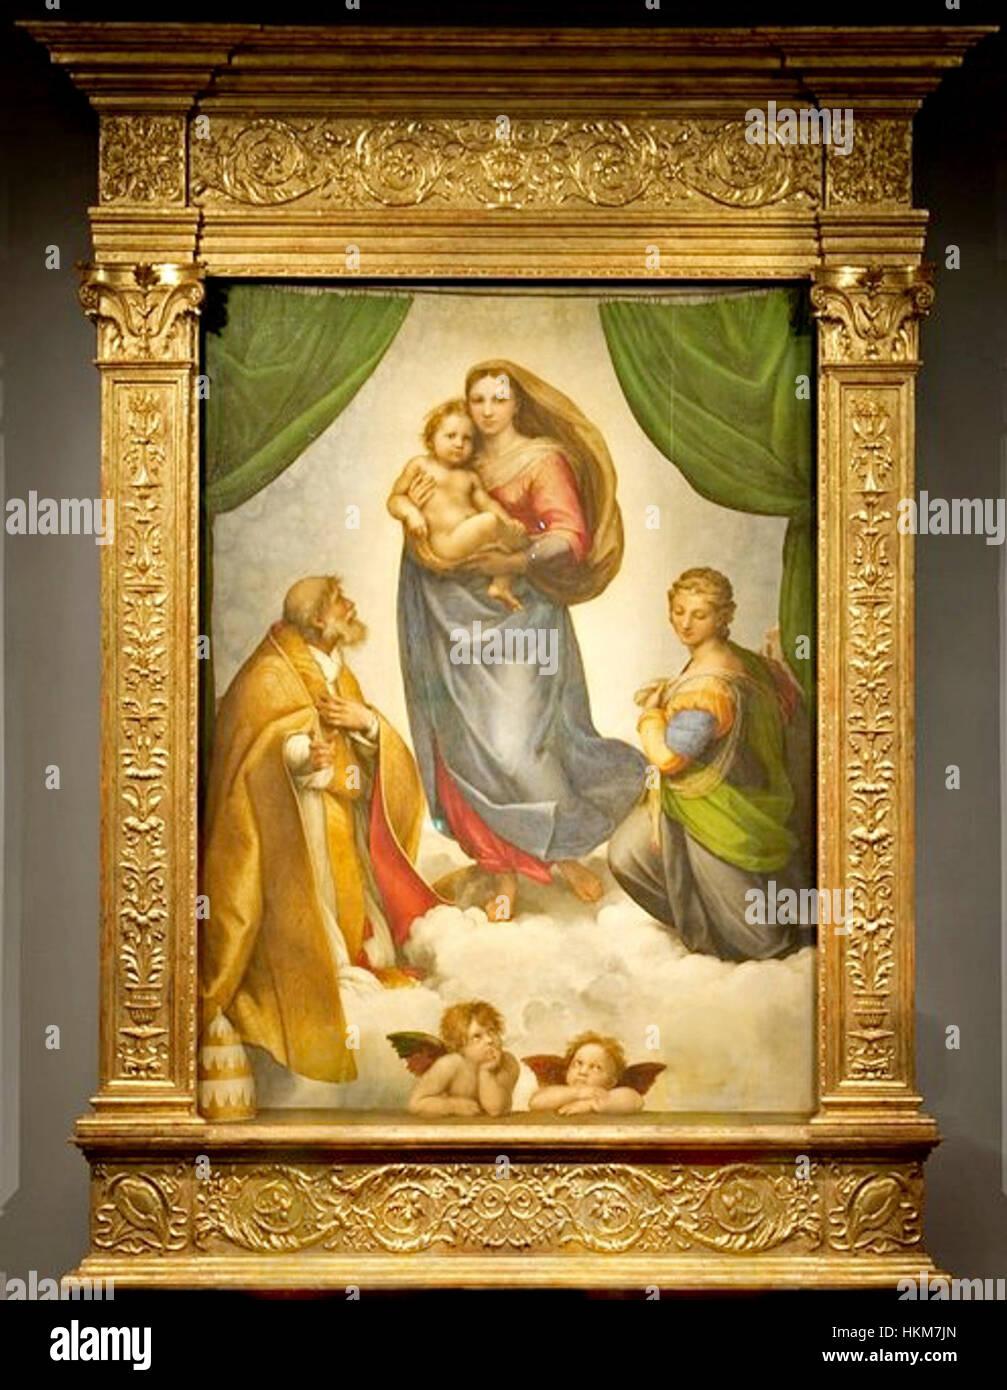 The Sistine Madonna of Raphael. Description of the picture 2